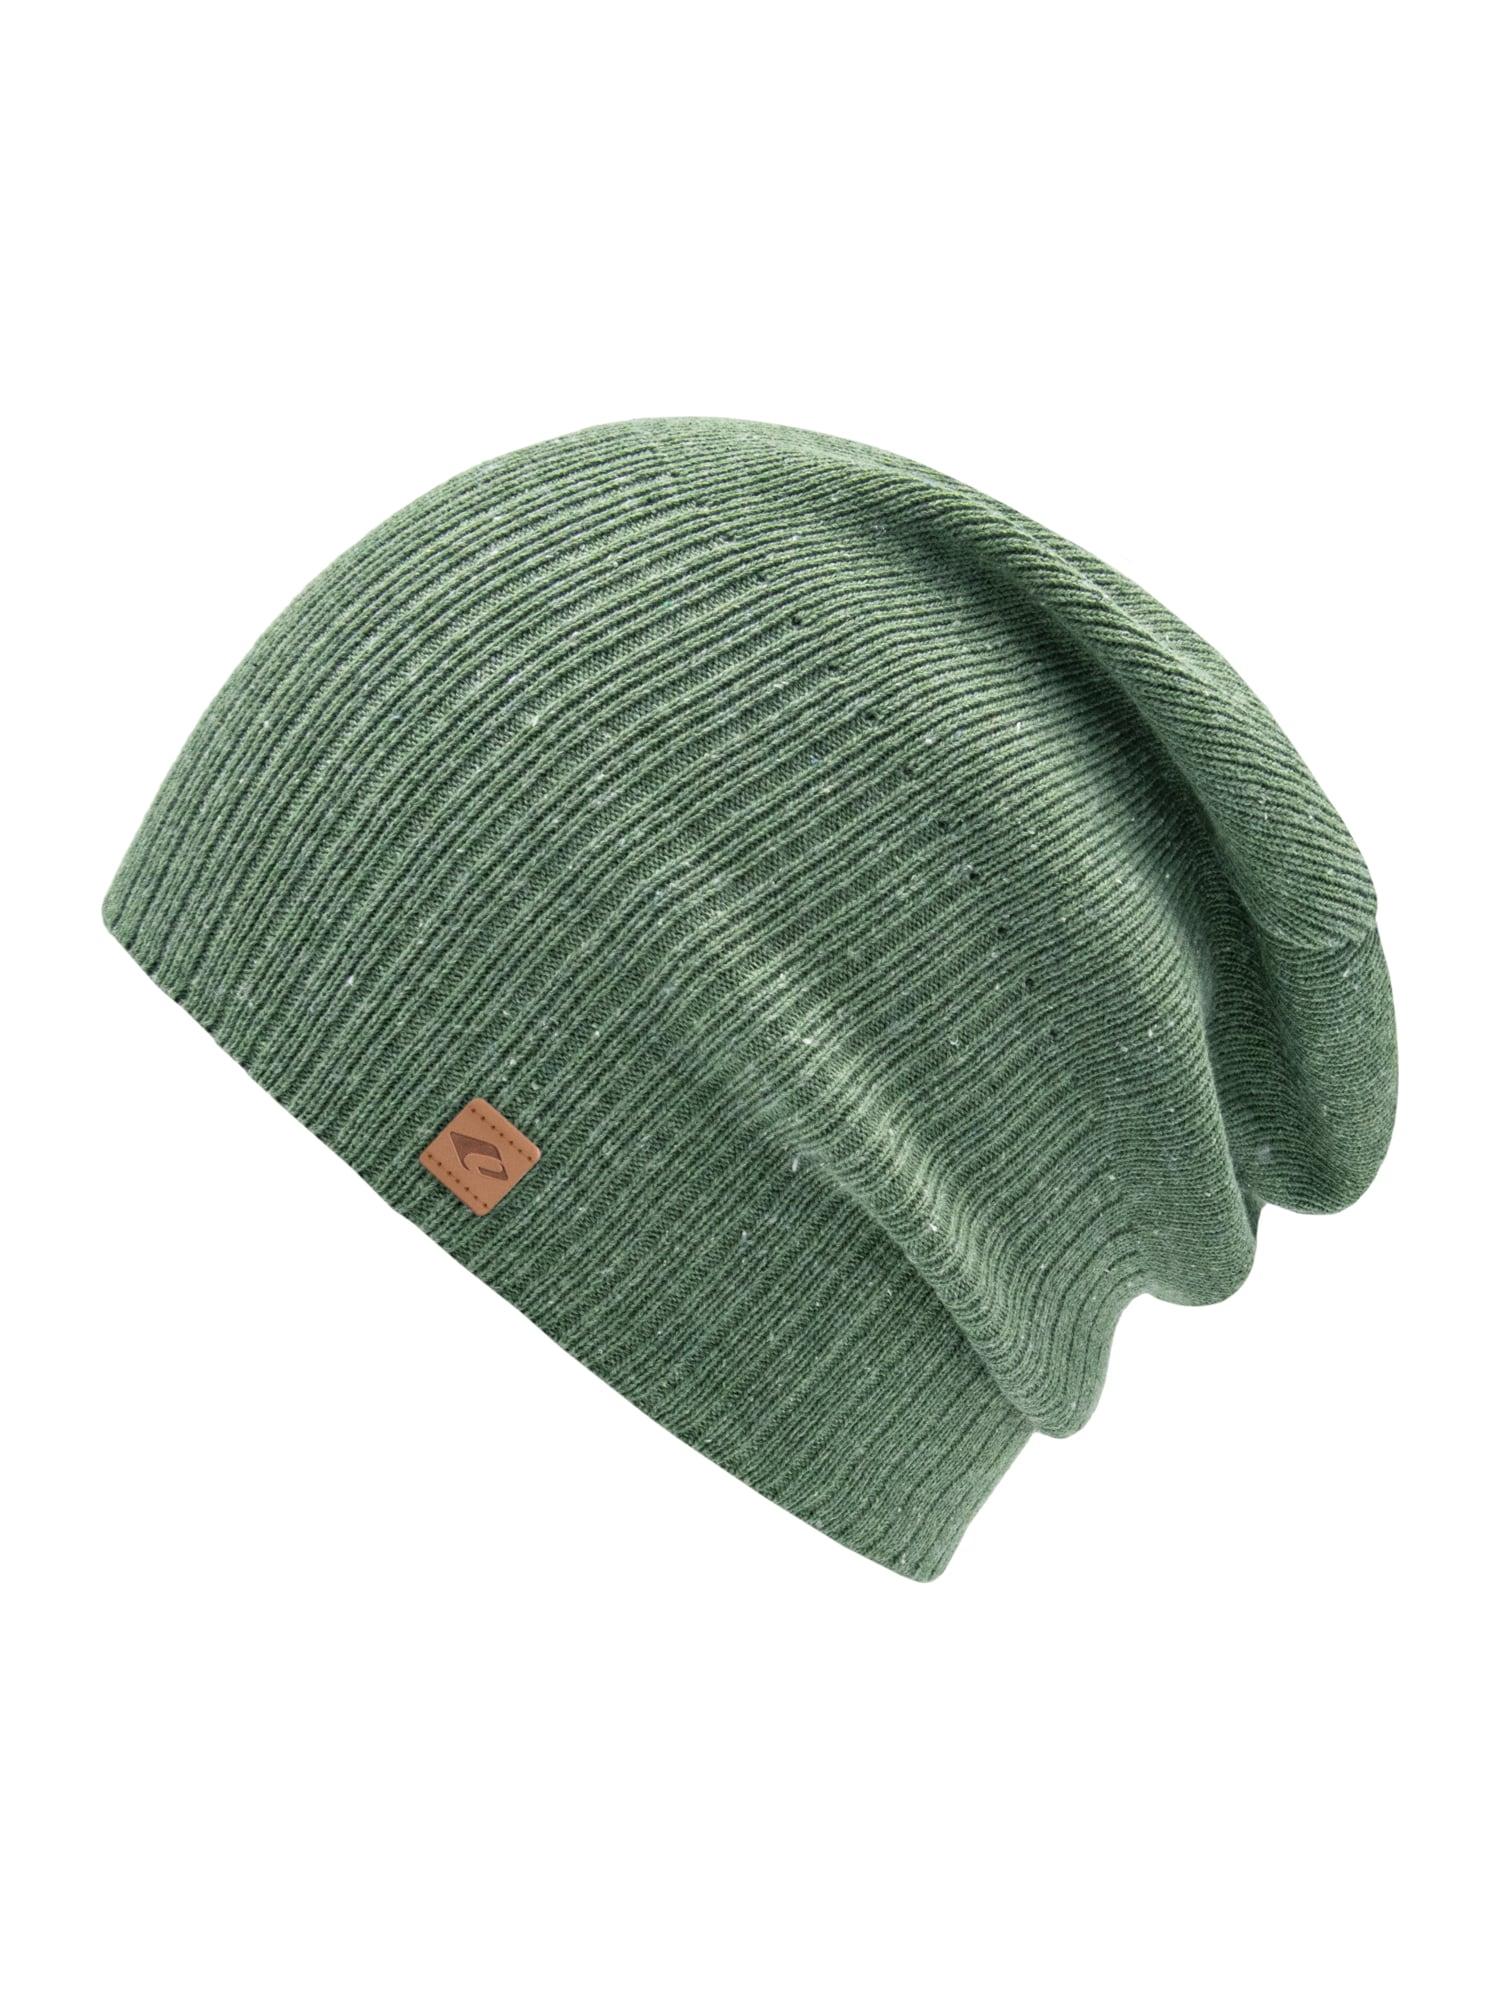 chillouts Megzta kepurė 'Lowell' žalia